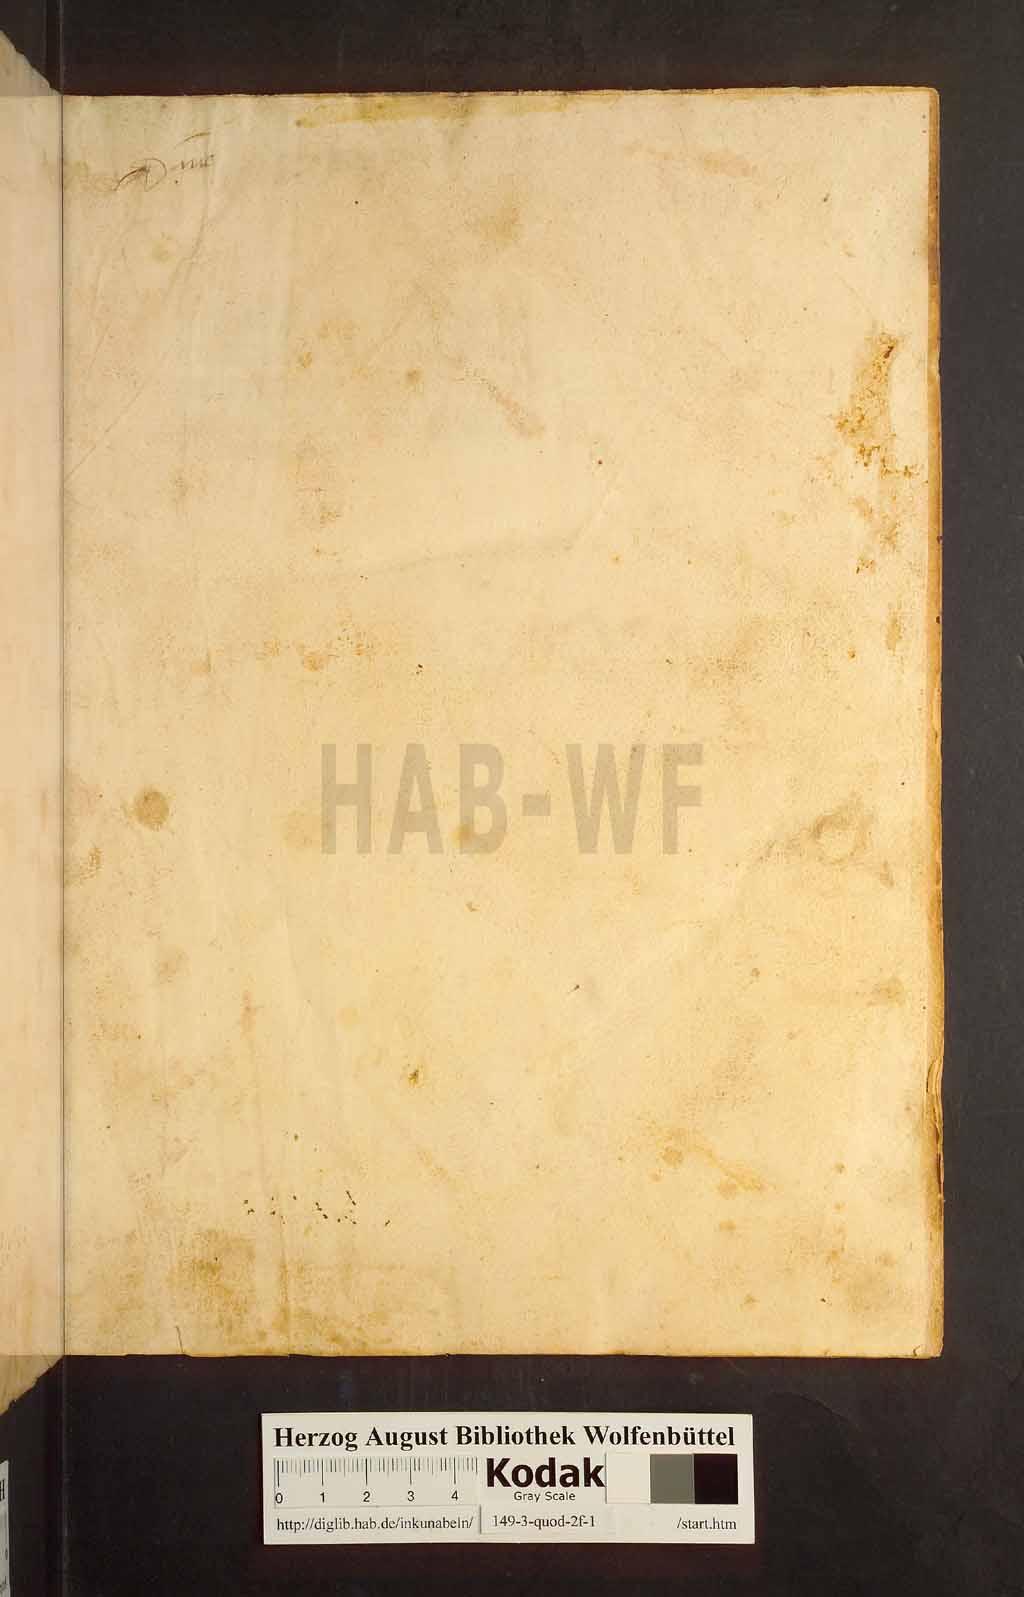 https://diglib.hab.de/inkunabeln/149-3-quod-2f-1/00001.jpg